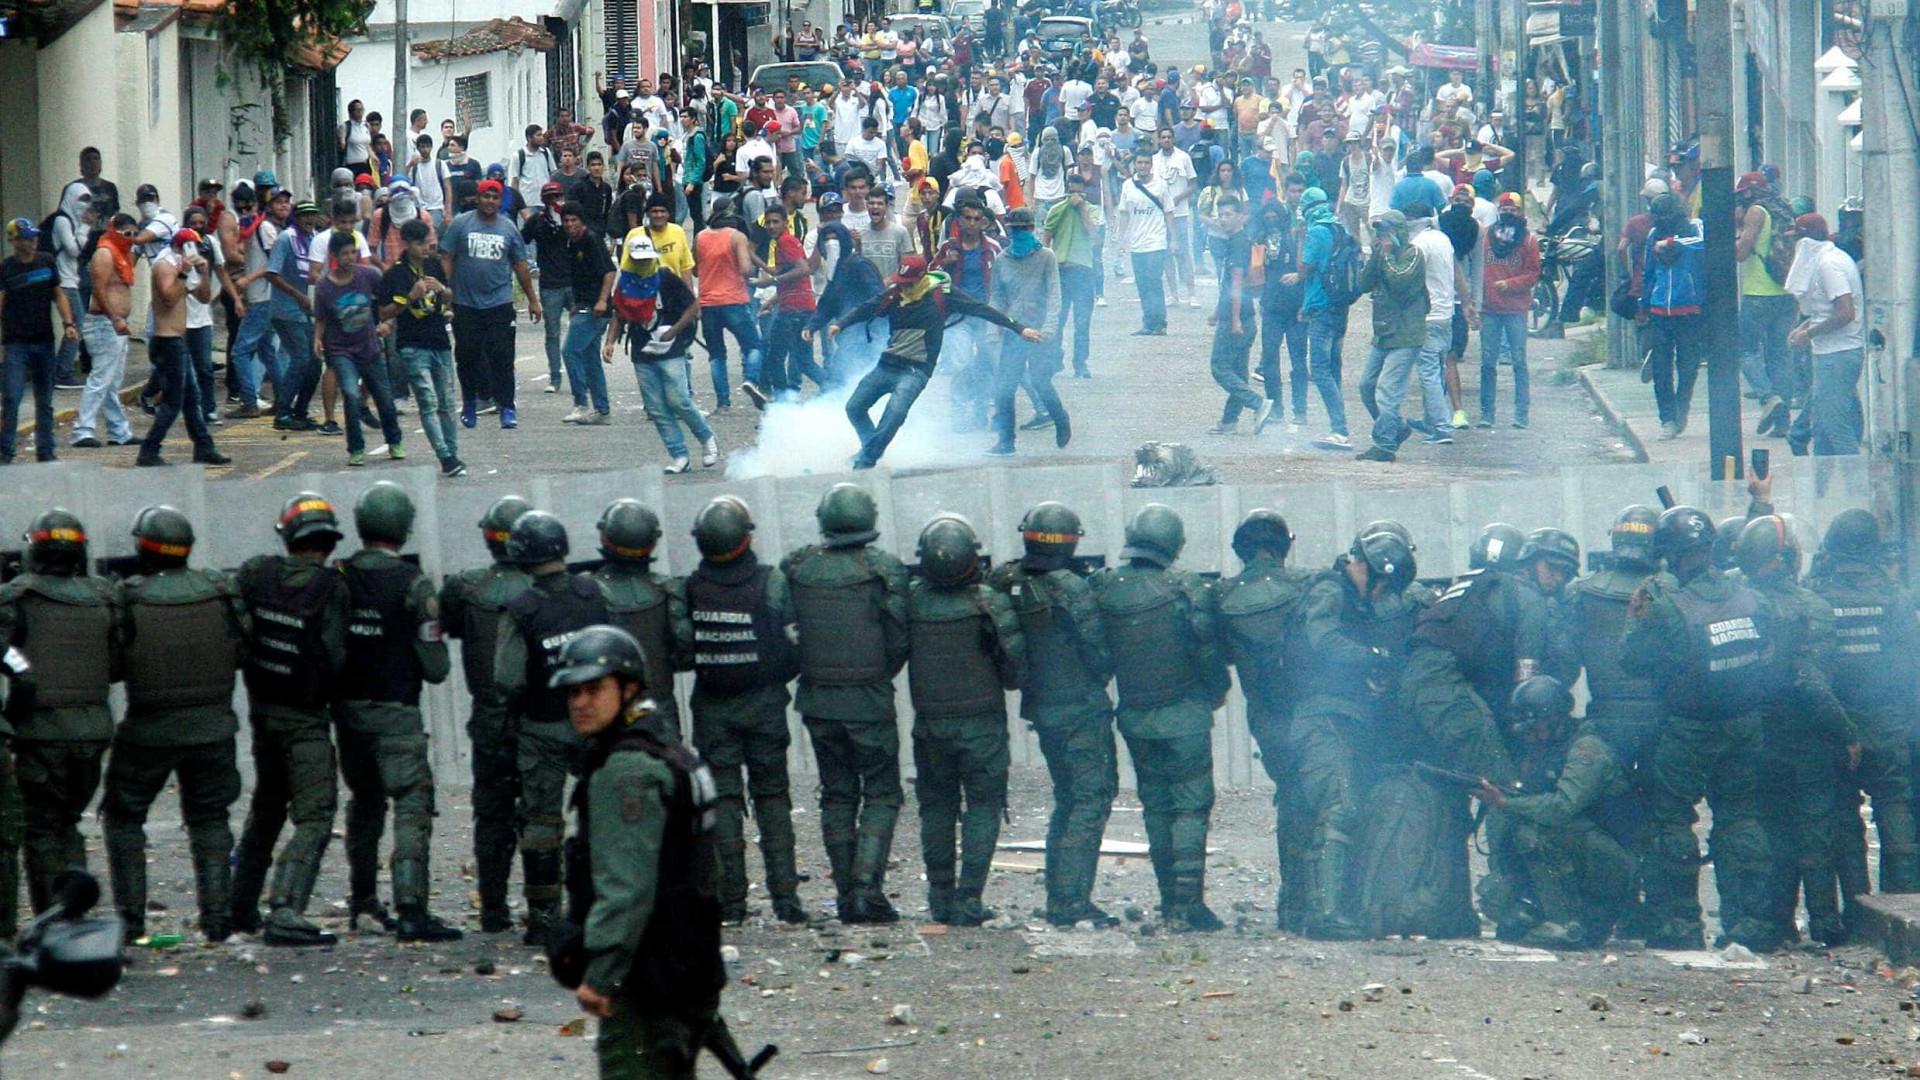 Polícia investigada por uso desproporcionado de força contra protestantes